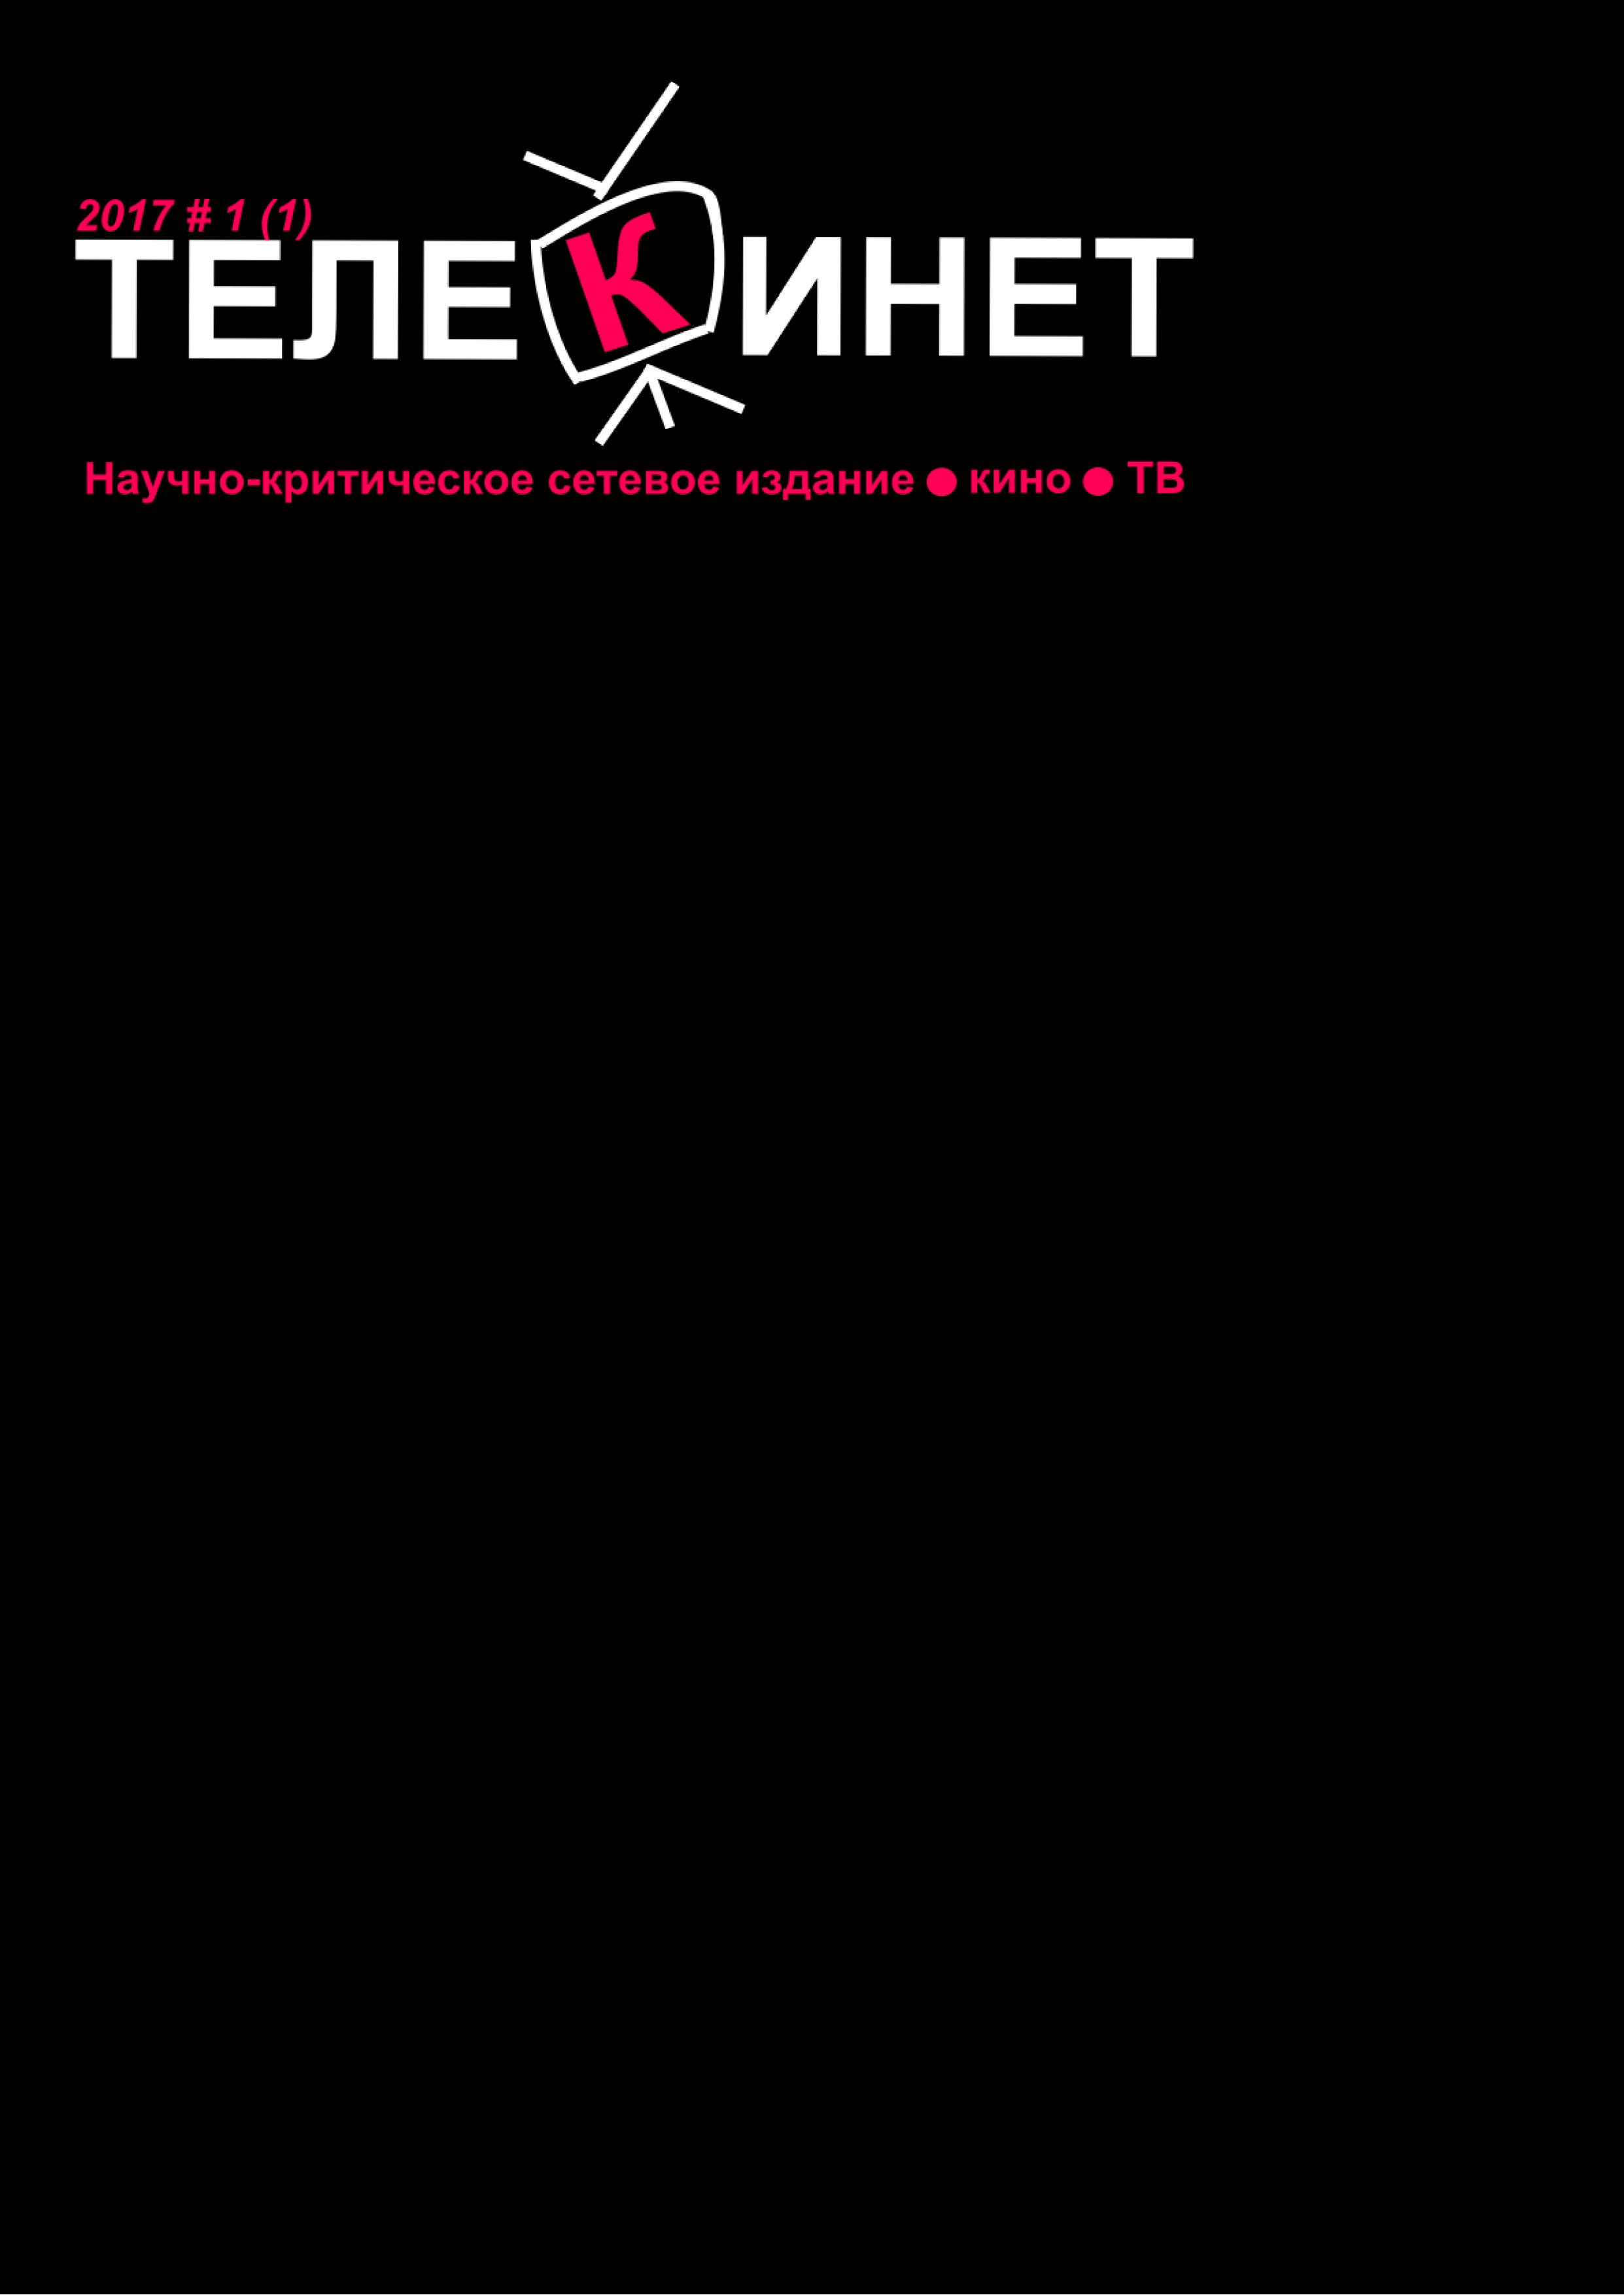 телекинет 1(1)